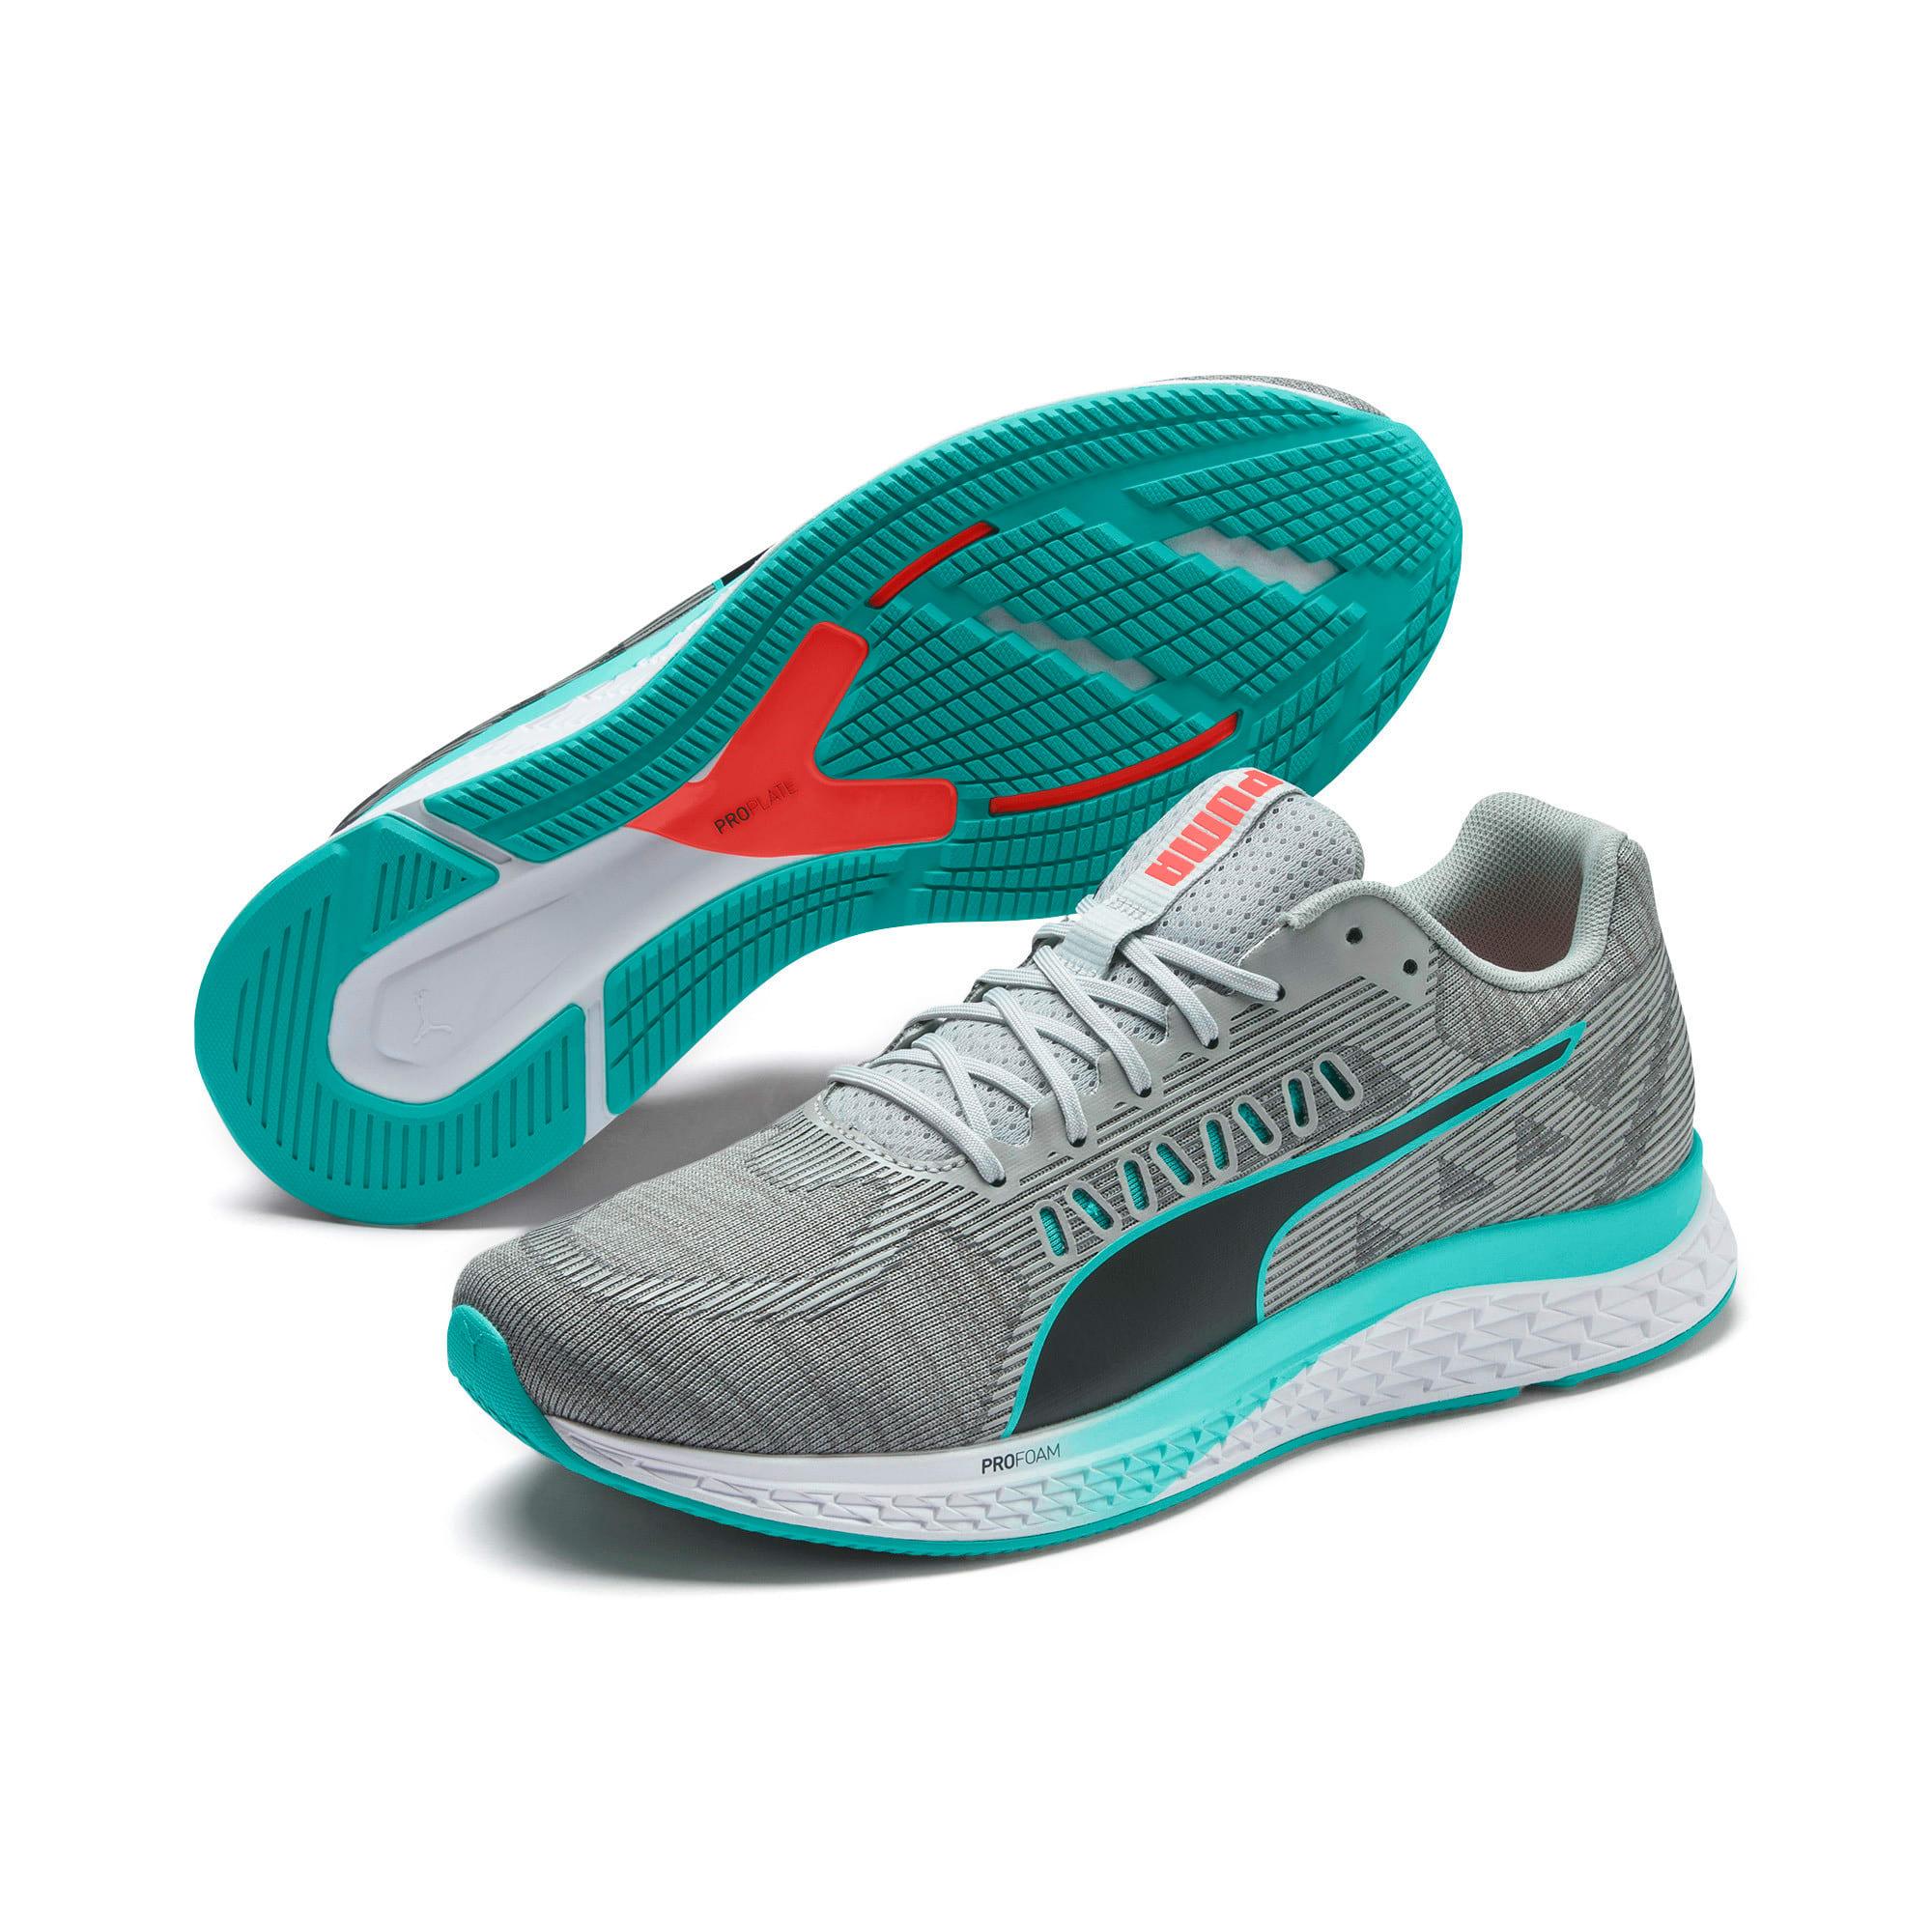 Thumbnail 3 of SPEED Sutamina Running Shoes, High Rise-Nrgy Red-Blue Turq, medium